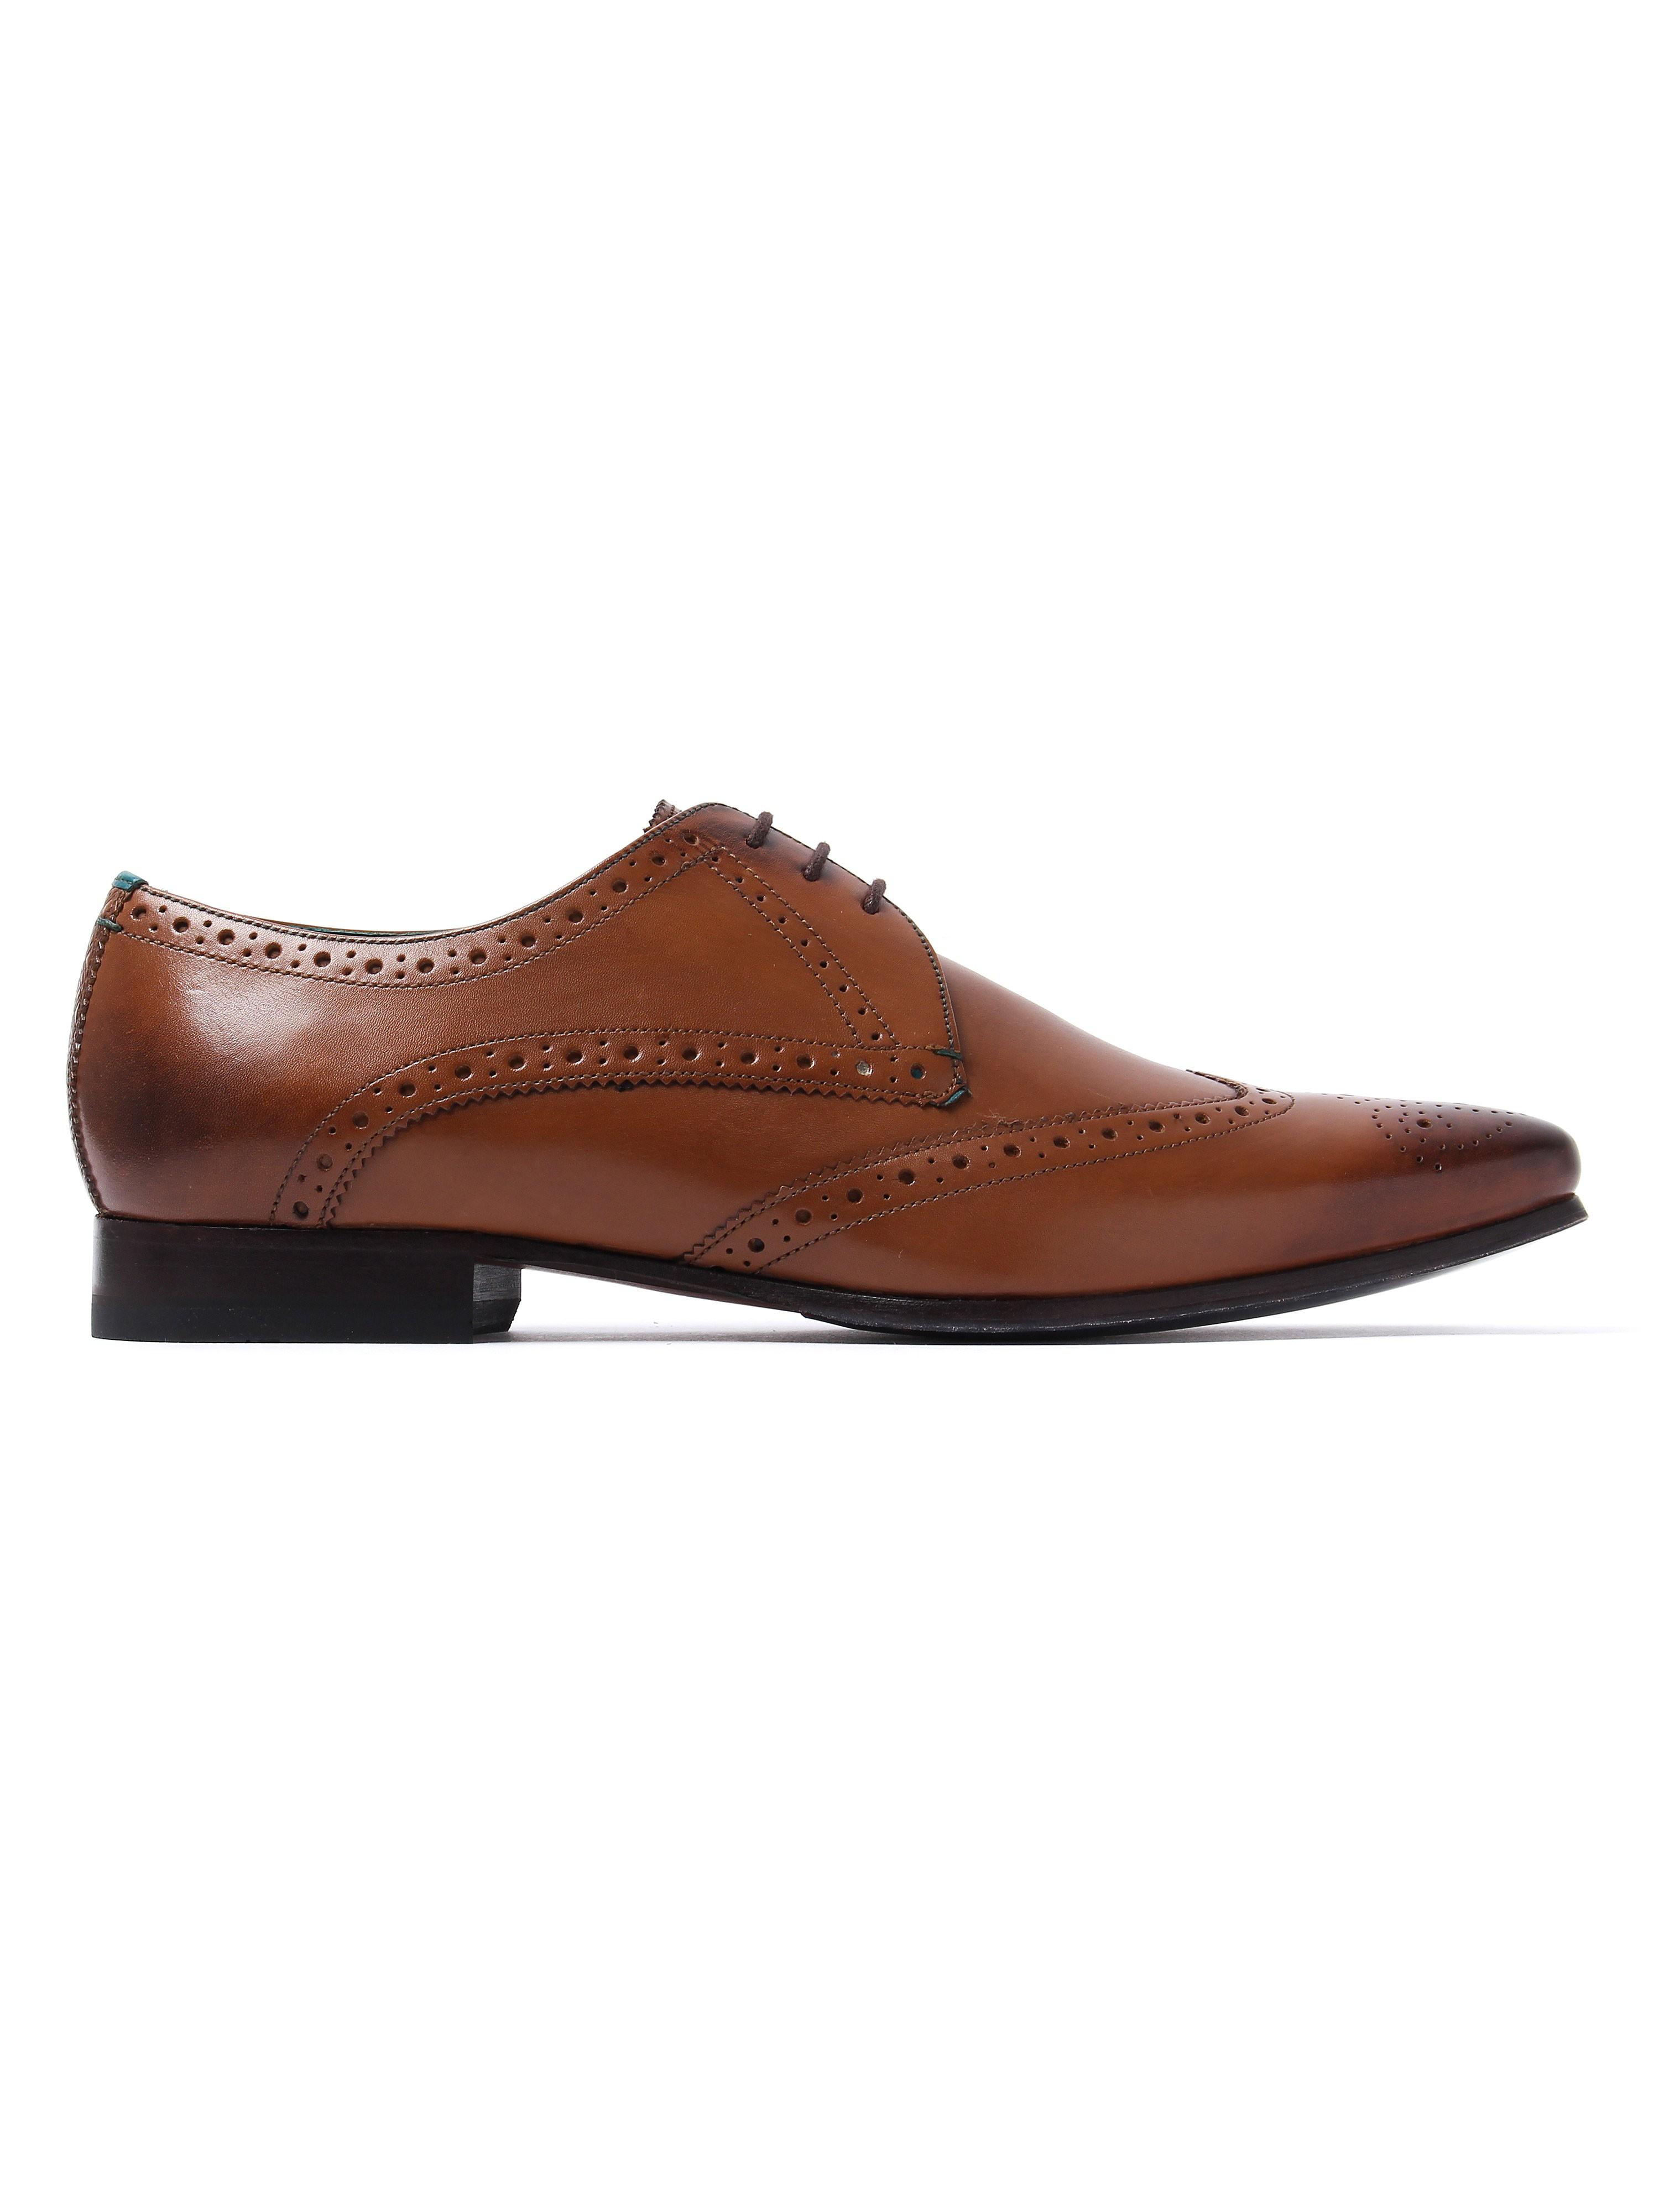 Ted Baker Men's Albbin Derby Shoes - Tan Leather